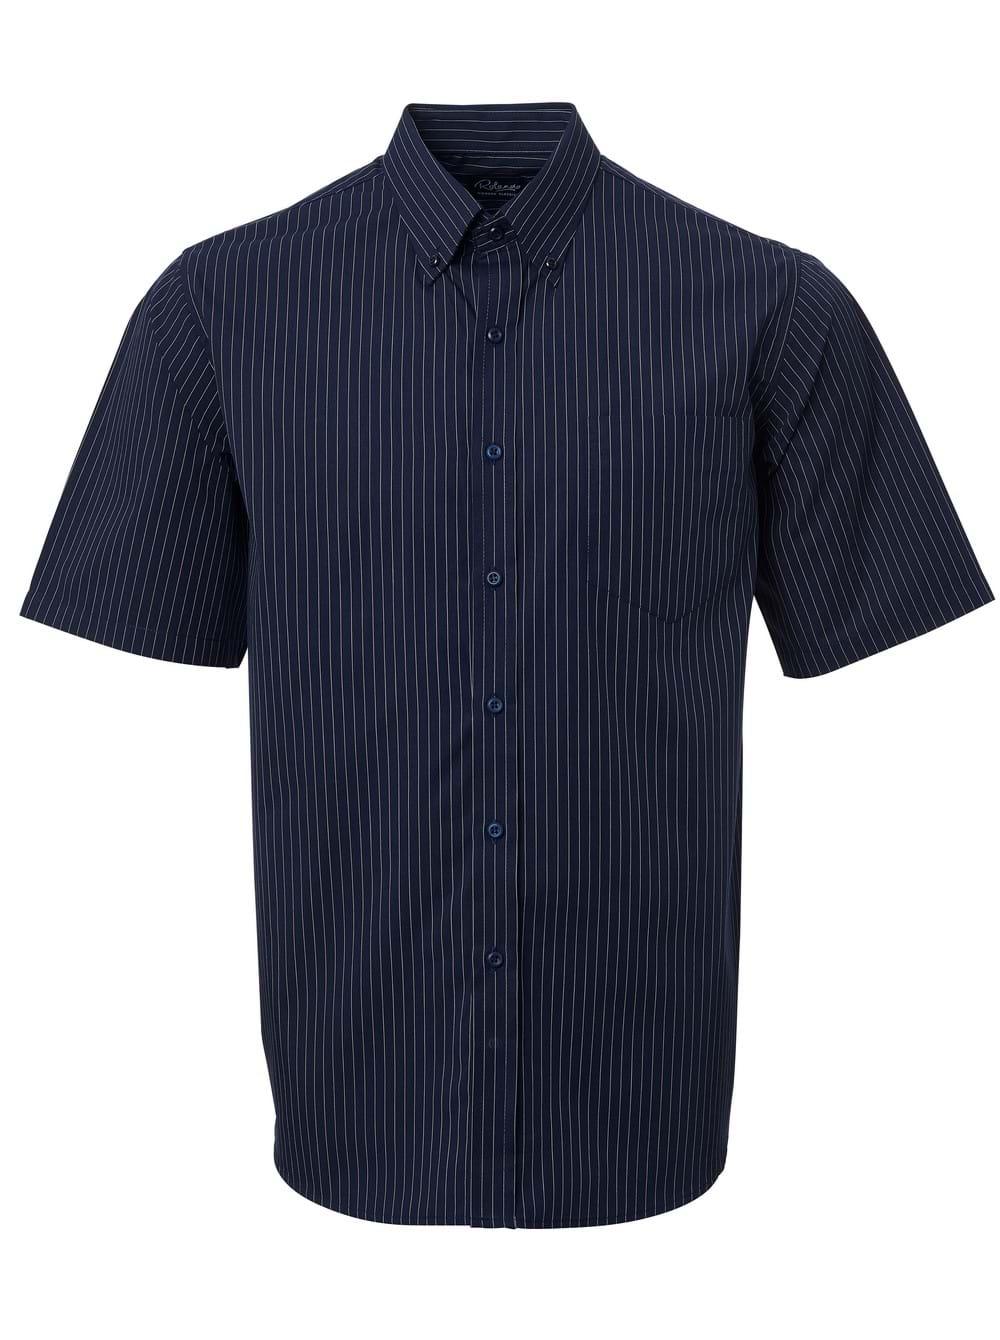 Mens Stripe Short Sleeve Shirt Navy